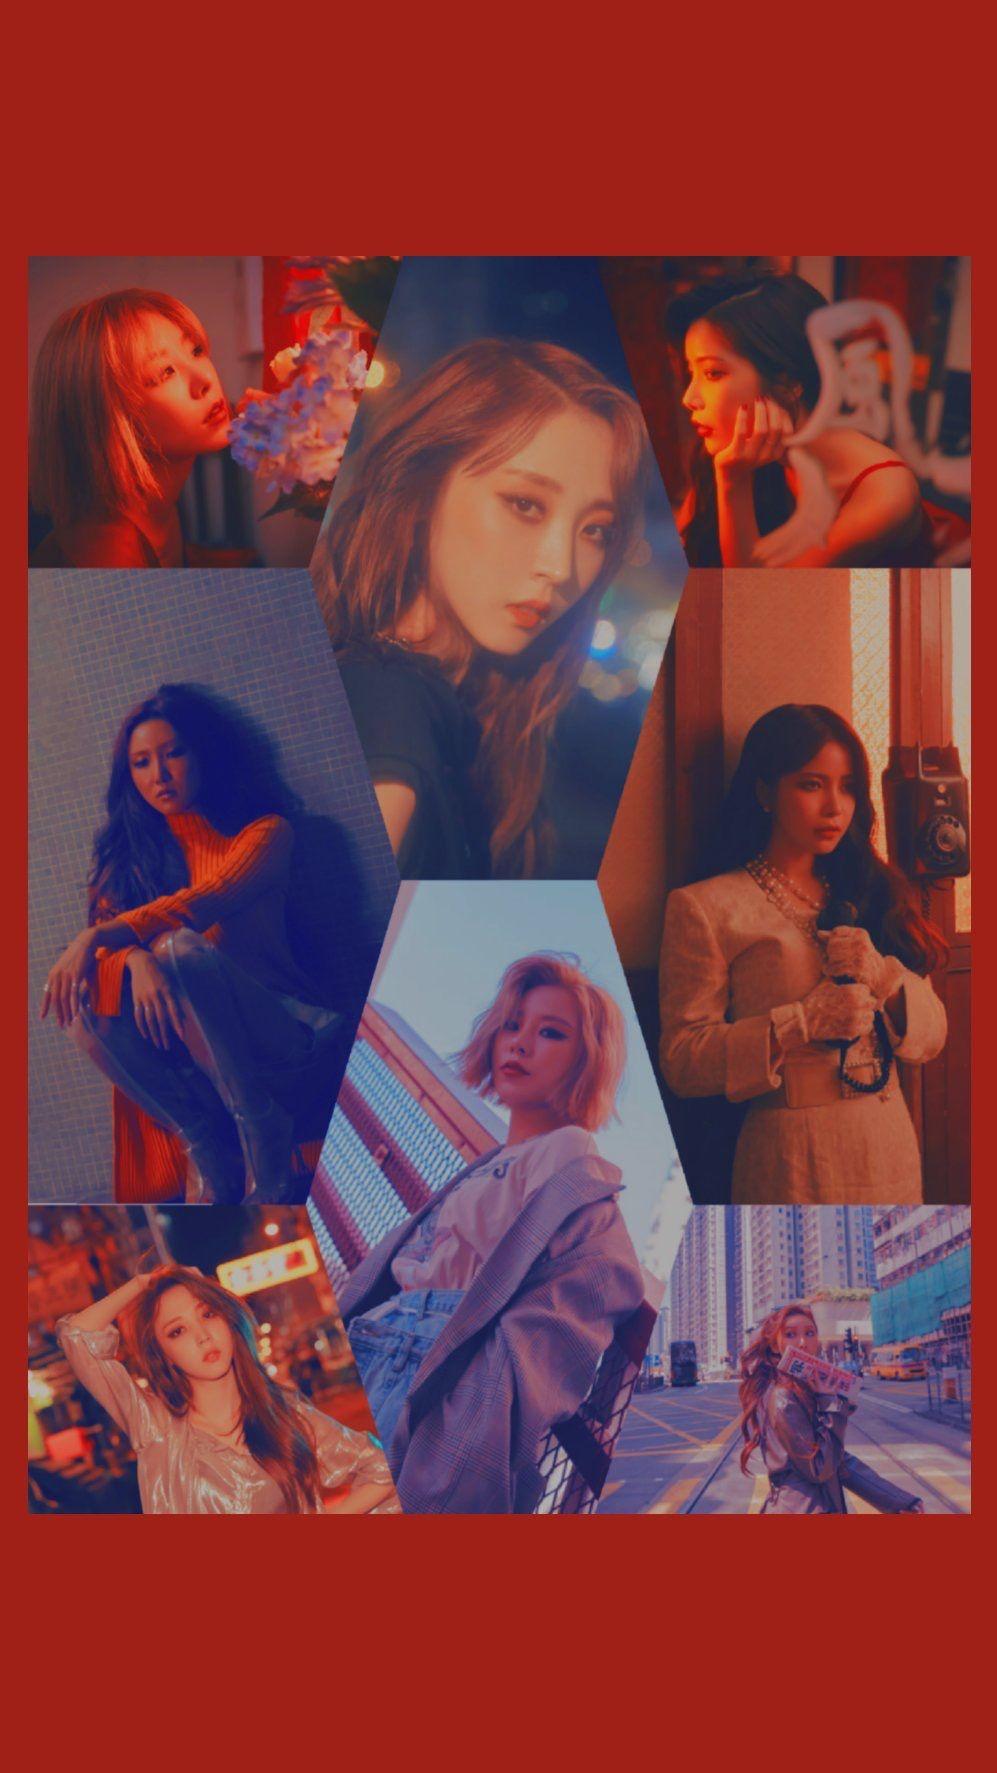 Wallpaper Mamamoo Wind Flower Mamamoo In 2019 Mamamoo Wallpaper